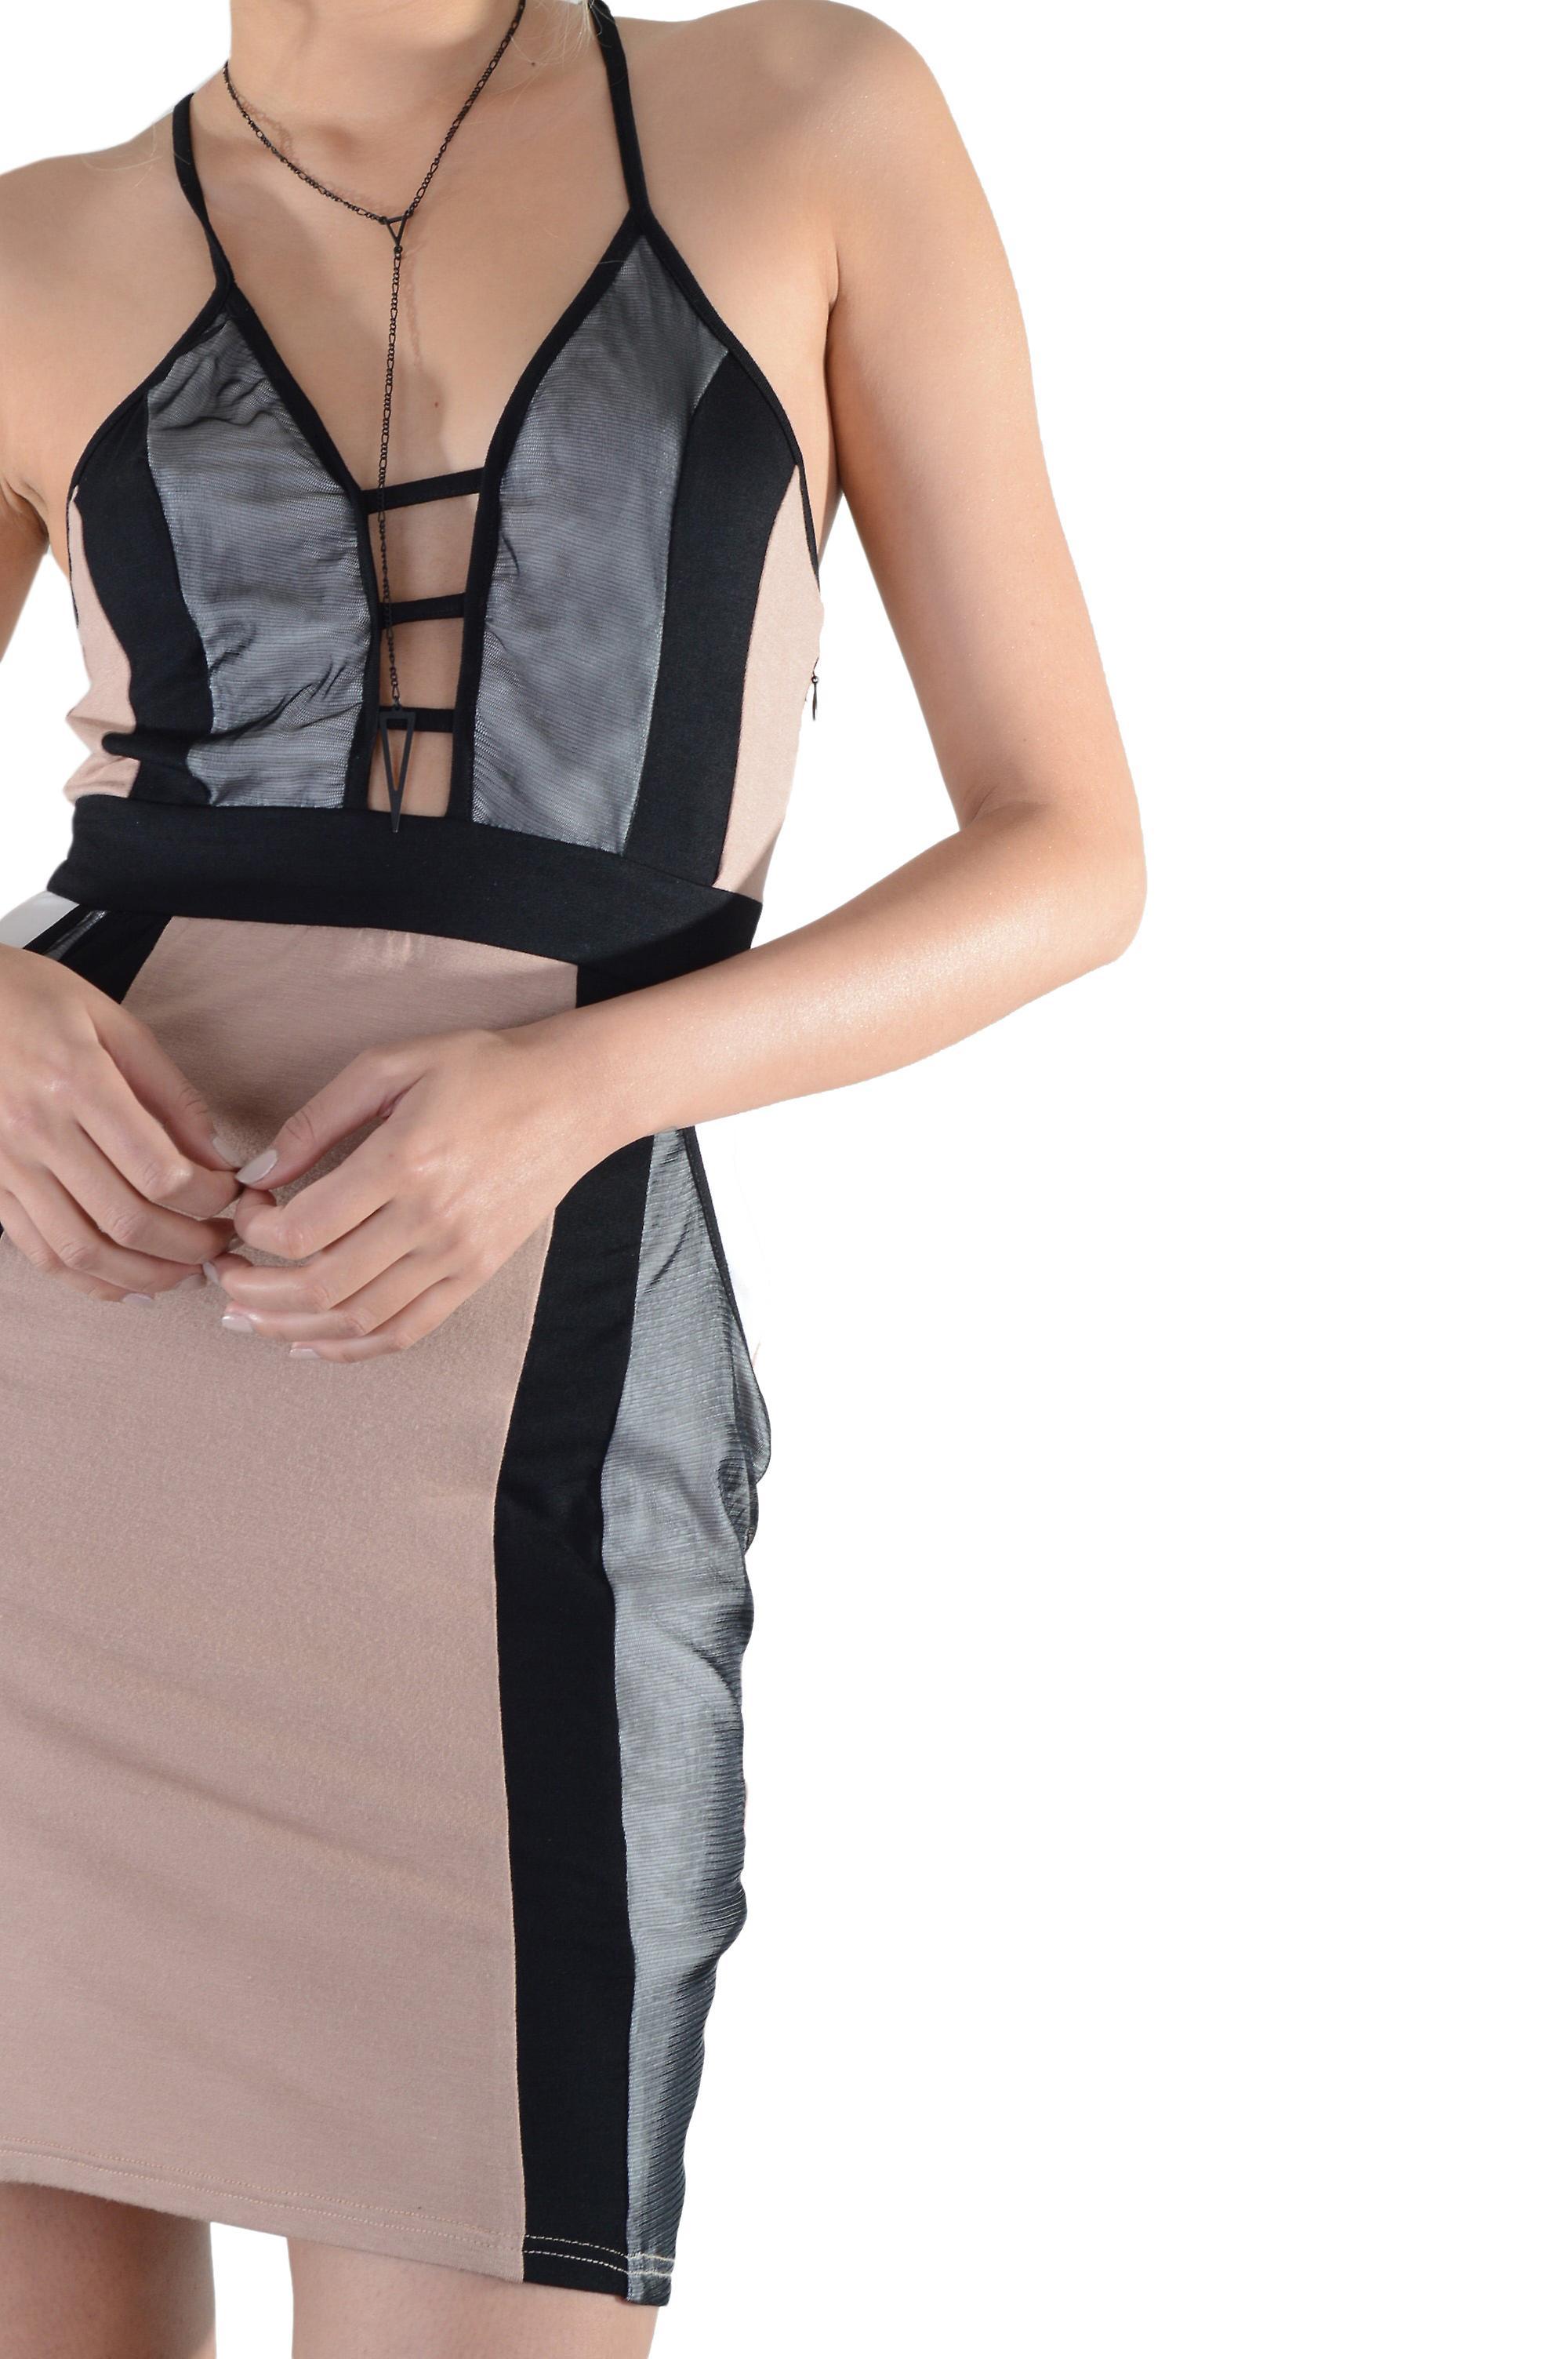 Lovemystyle Spaghetti Strap Nude V-Neck Dress With Mesh Inserts